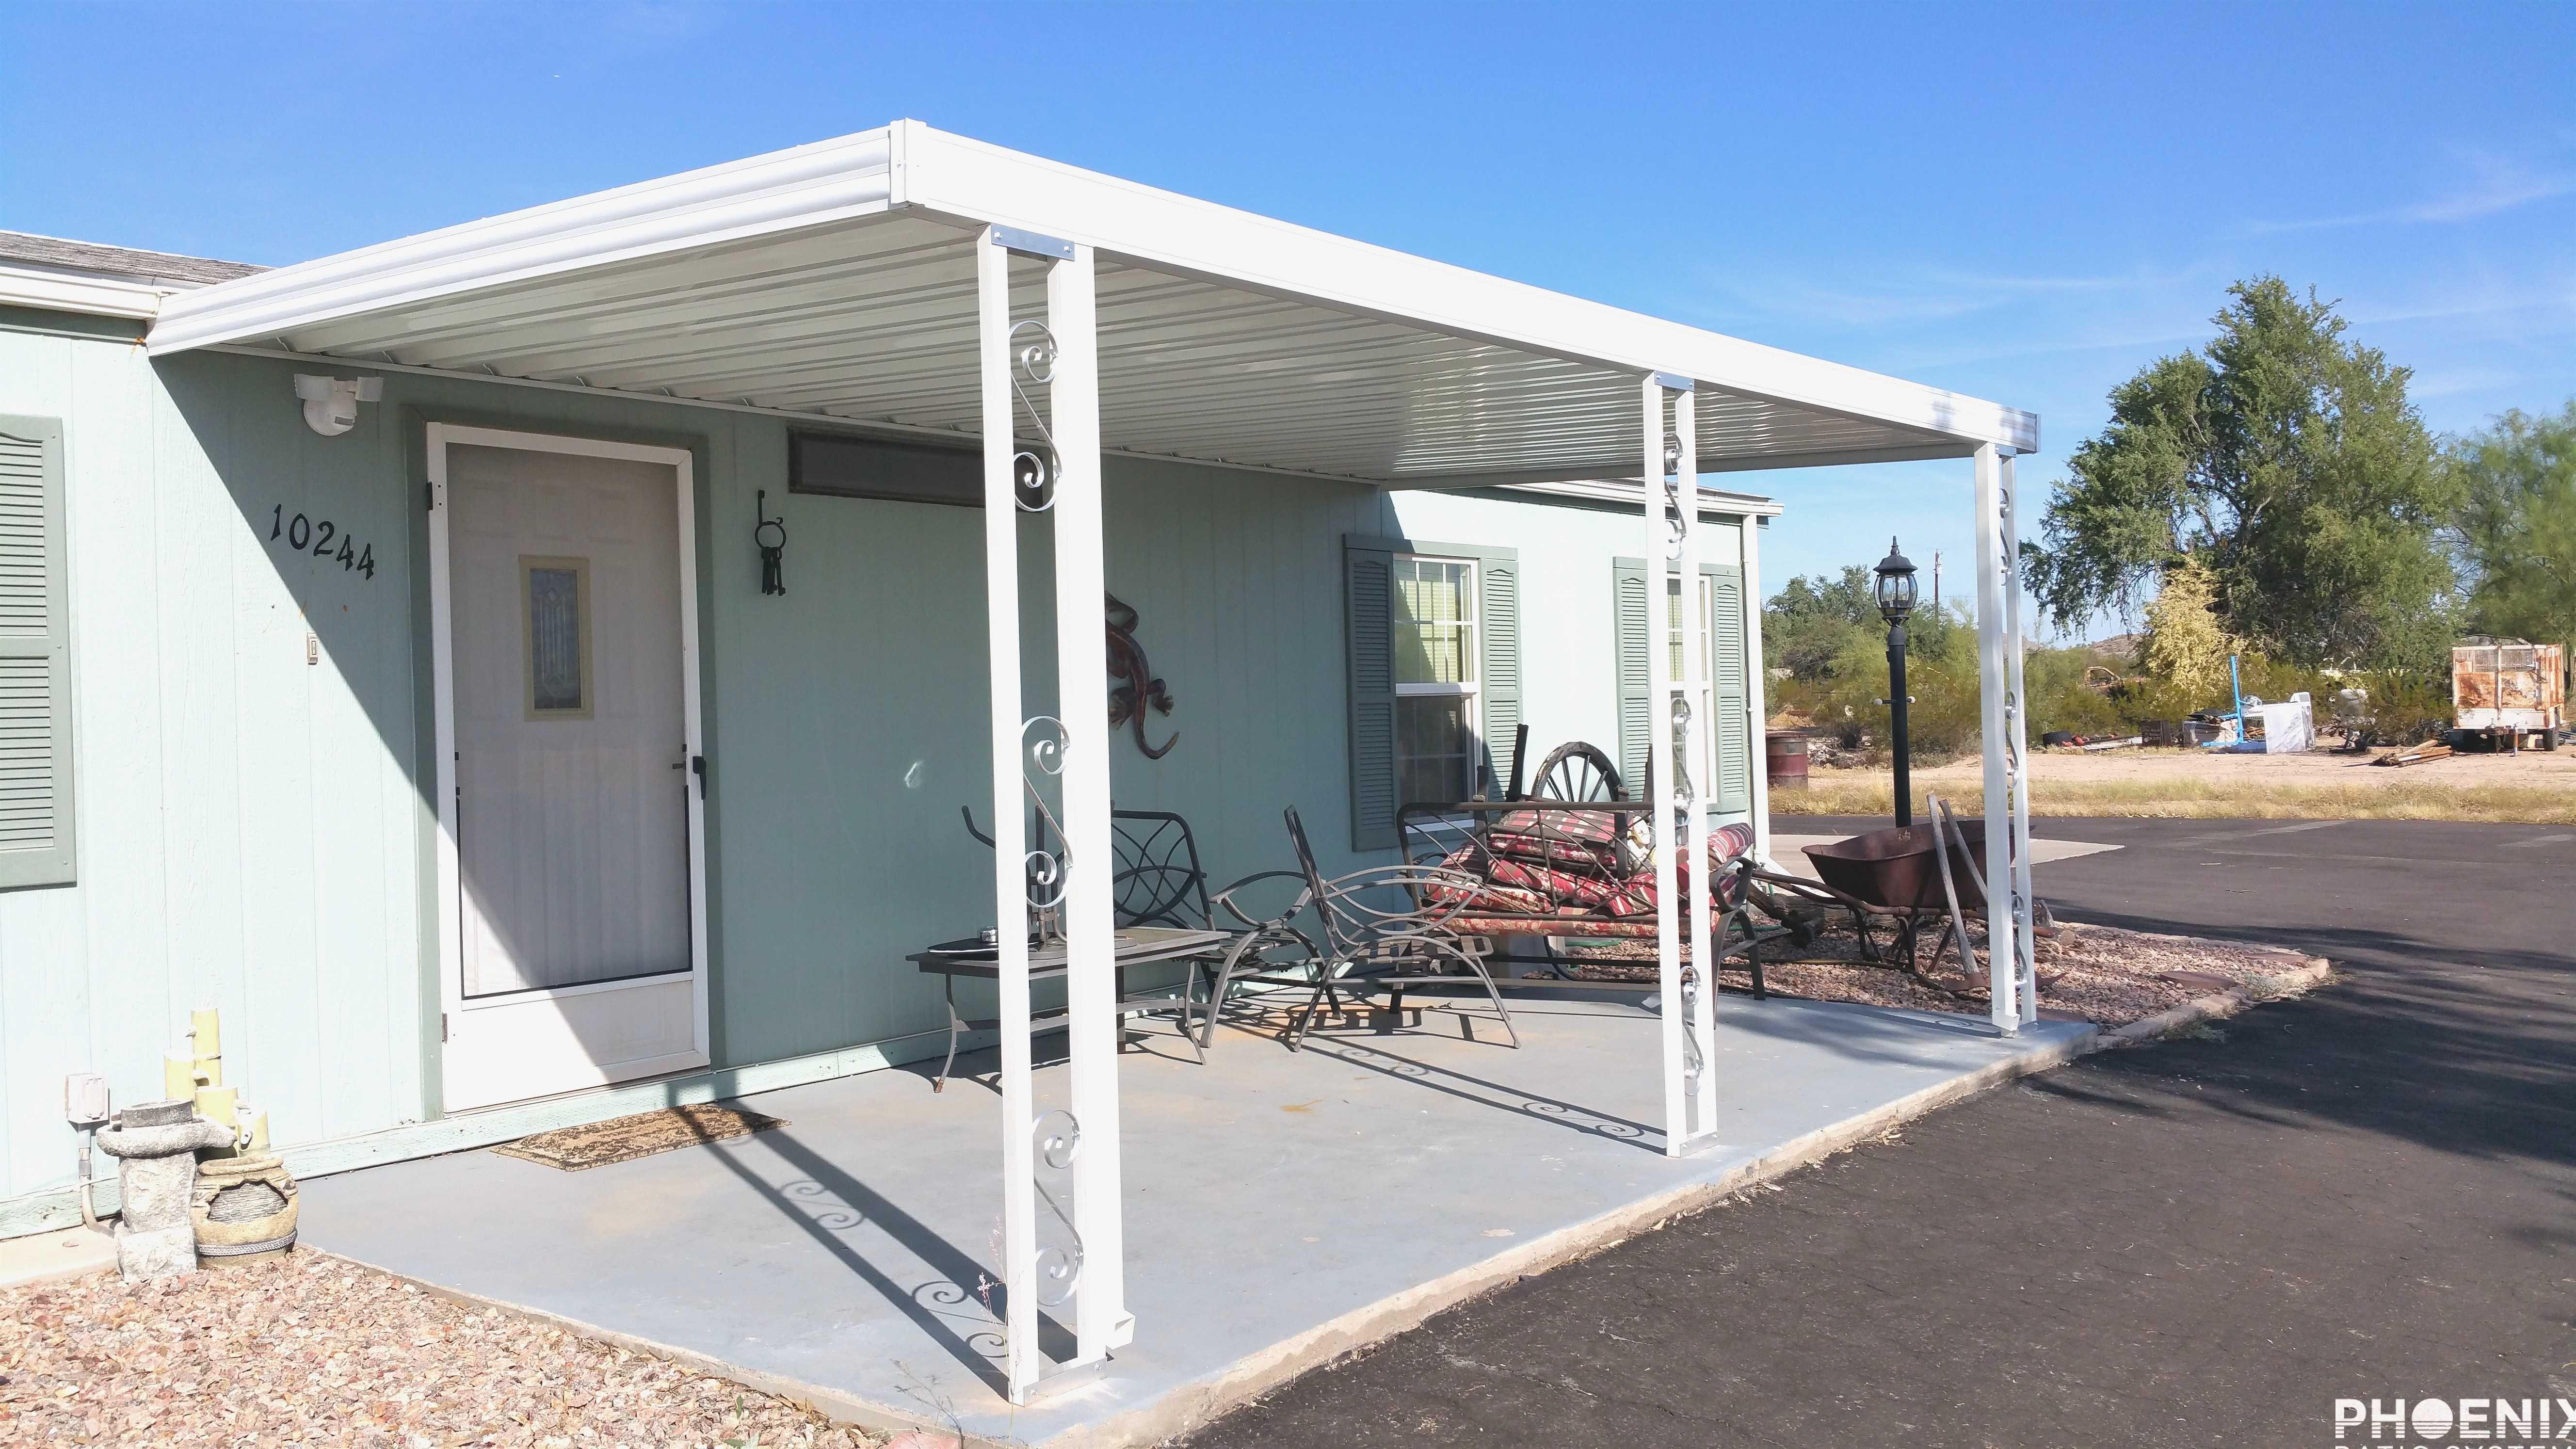 Cheap Carports Carport Garage Portable Carport Diy Carport Palram Carport Wood Carport House Carport With Images Aluminum Awnings Pergola On The Roof Aluminum Roof